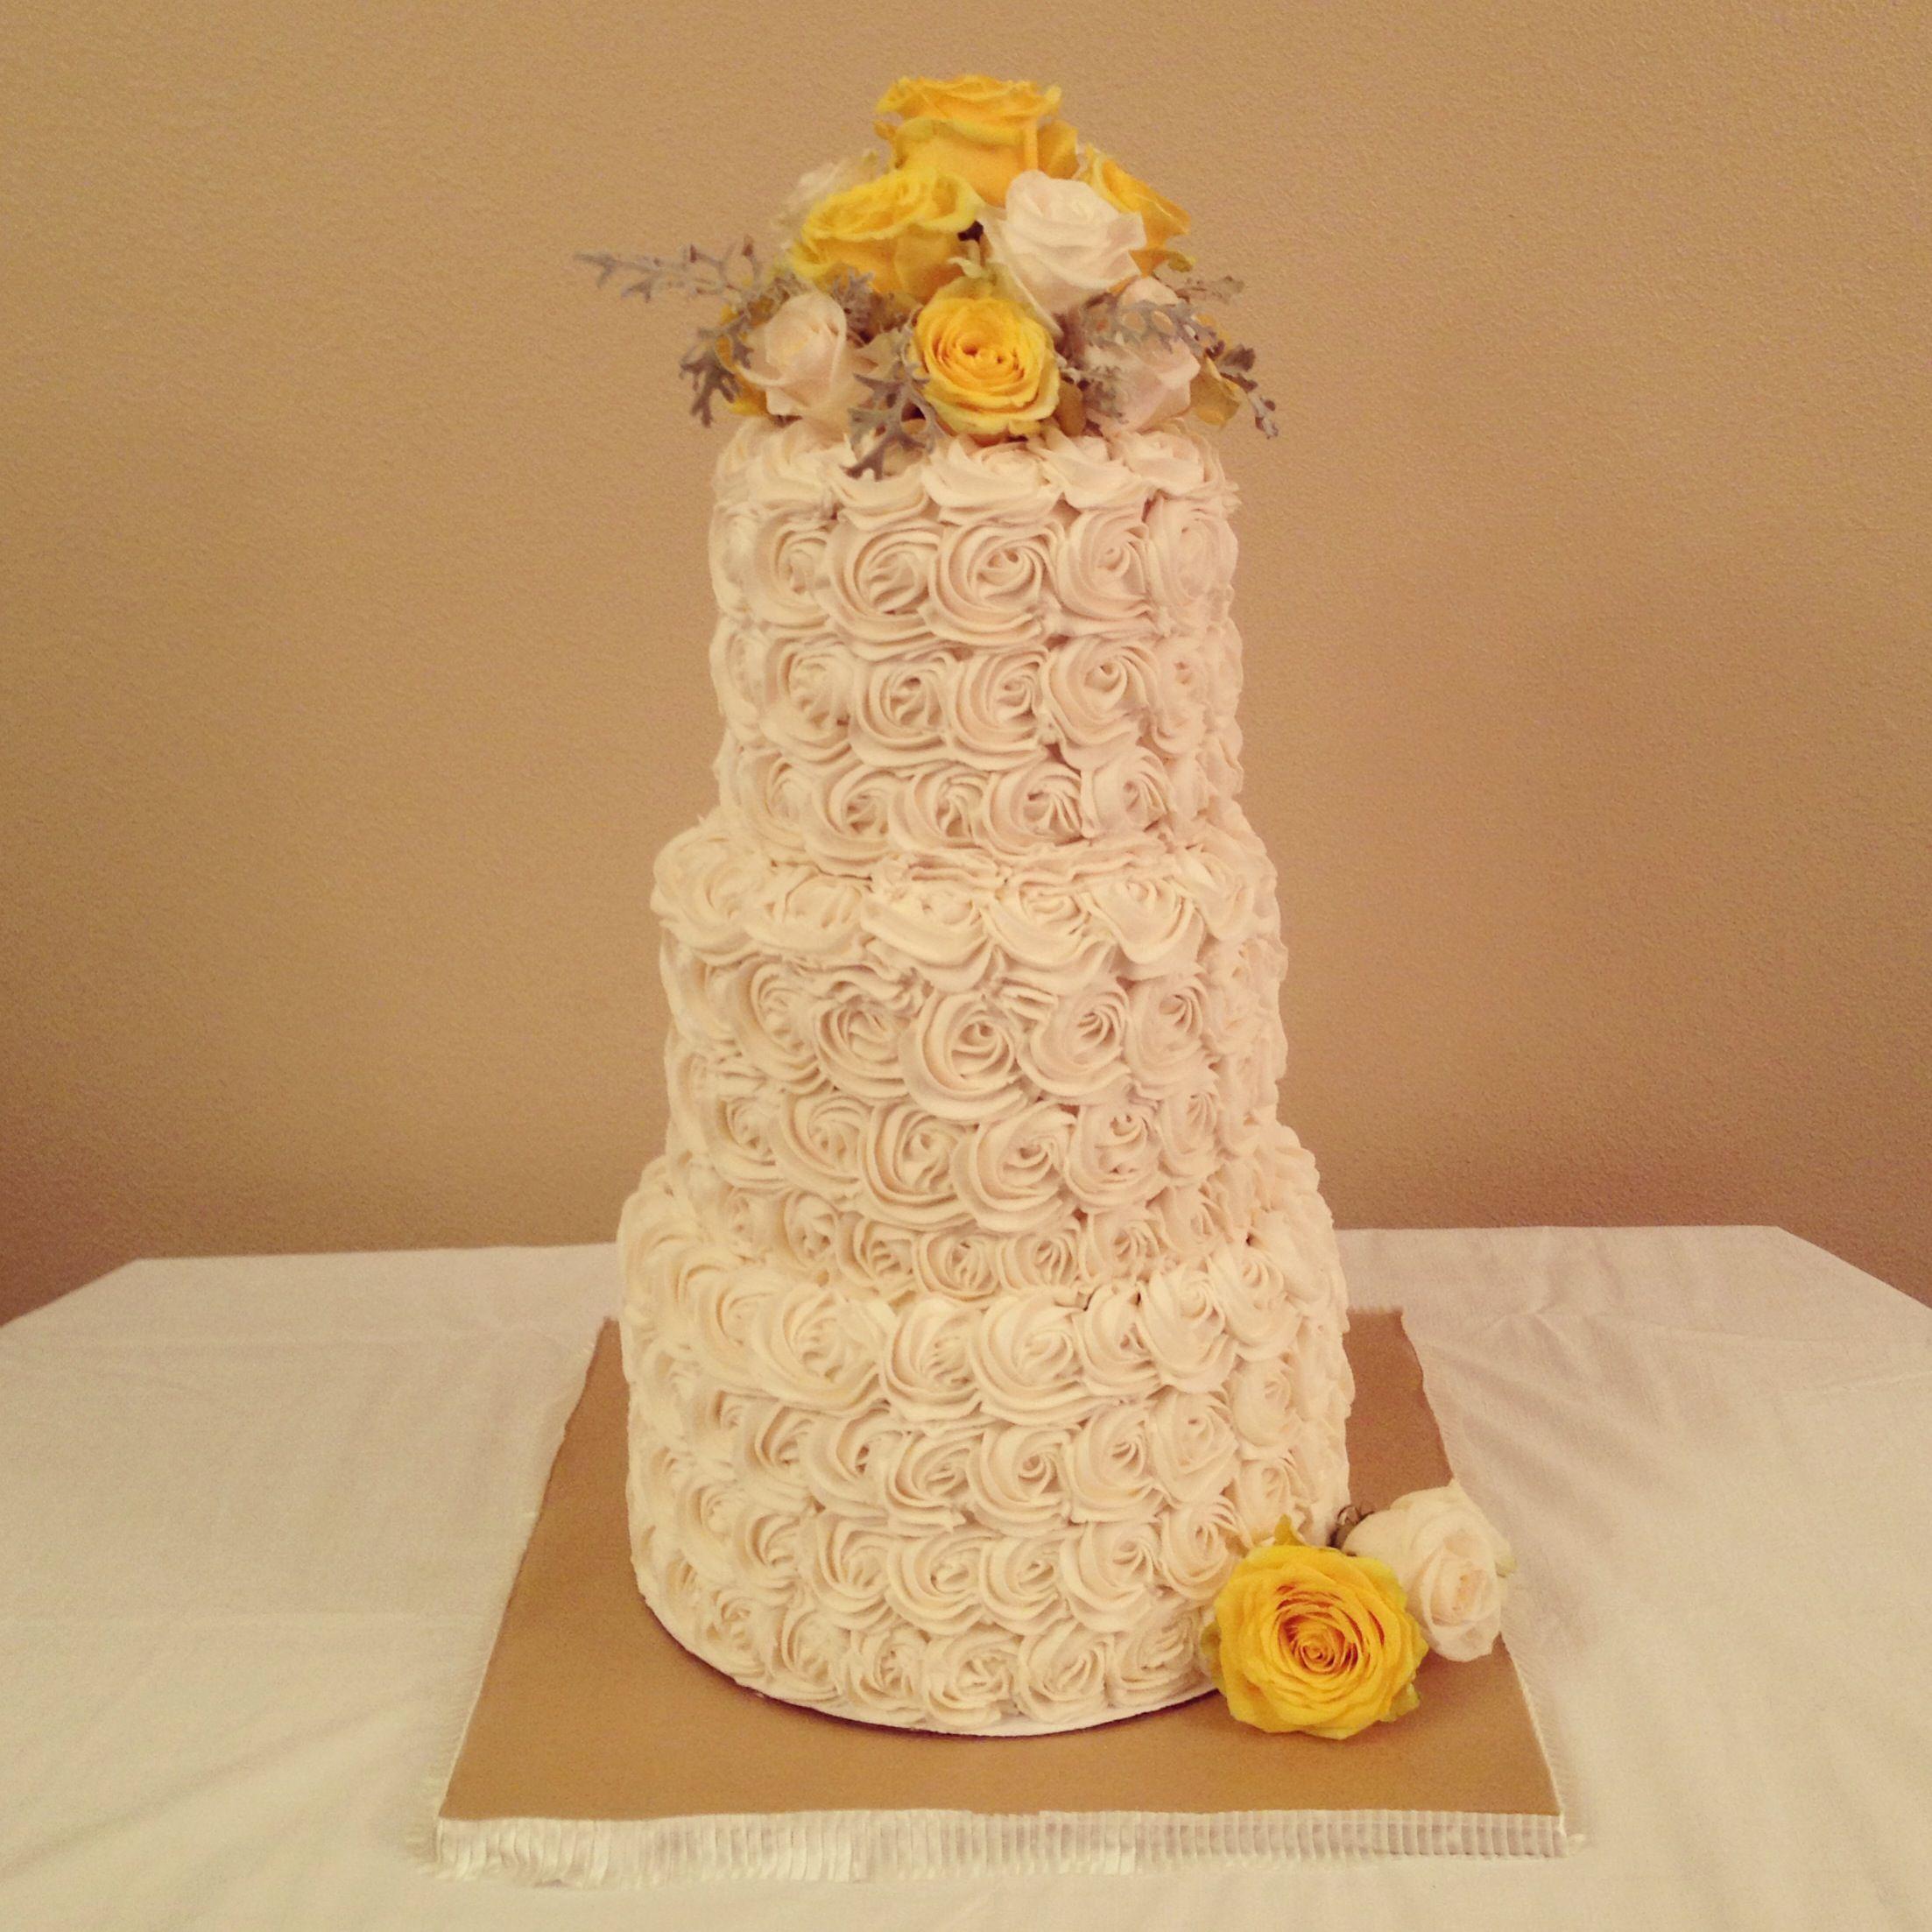 Pin by Jamison-Danielle Ferrin on Blackburn Wedding | Pinterest